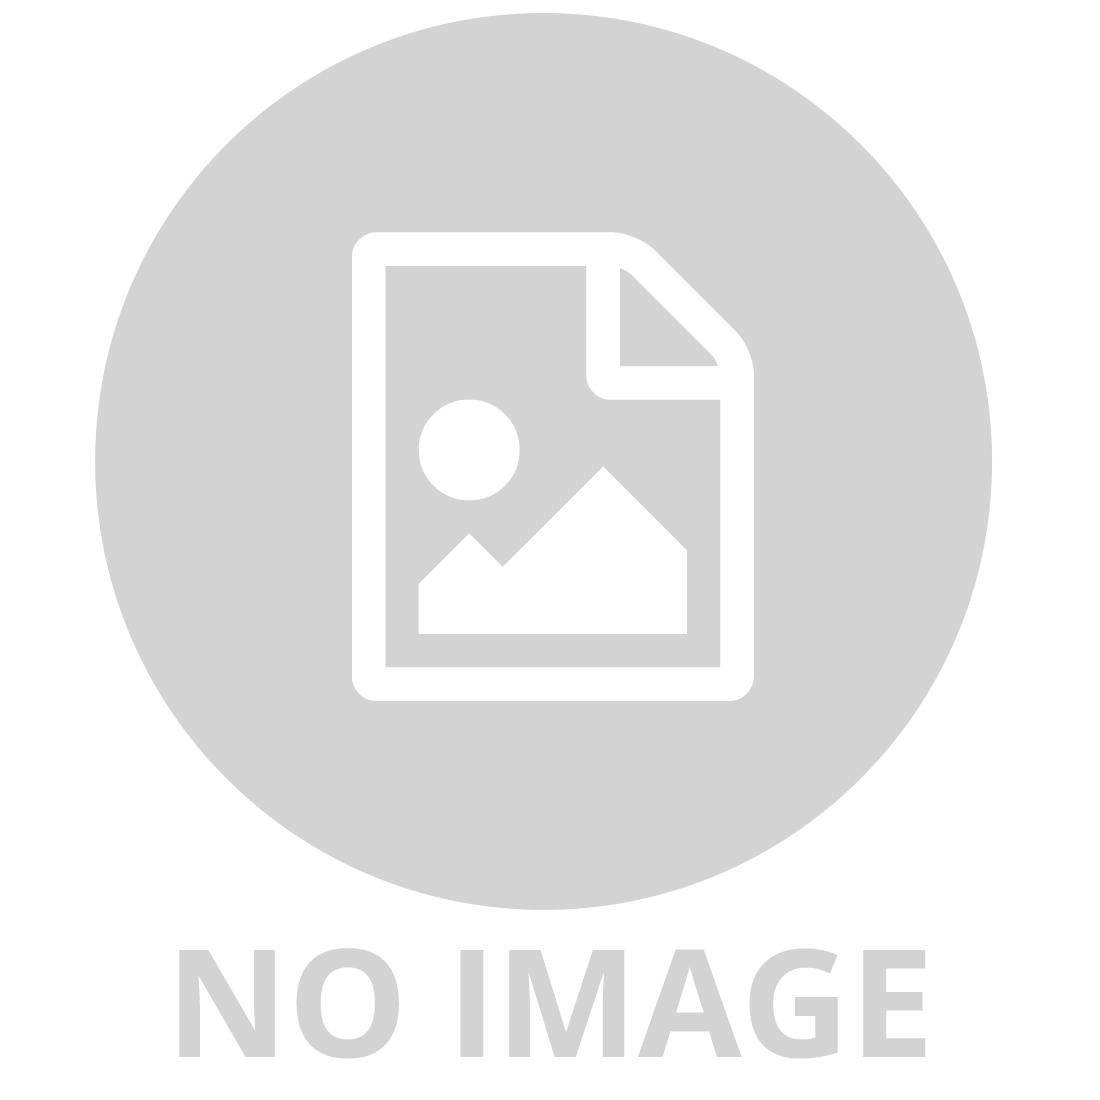 LEGO MARVEL 76113 SPIDER-MAN BIKE RESCUE